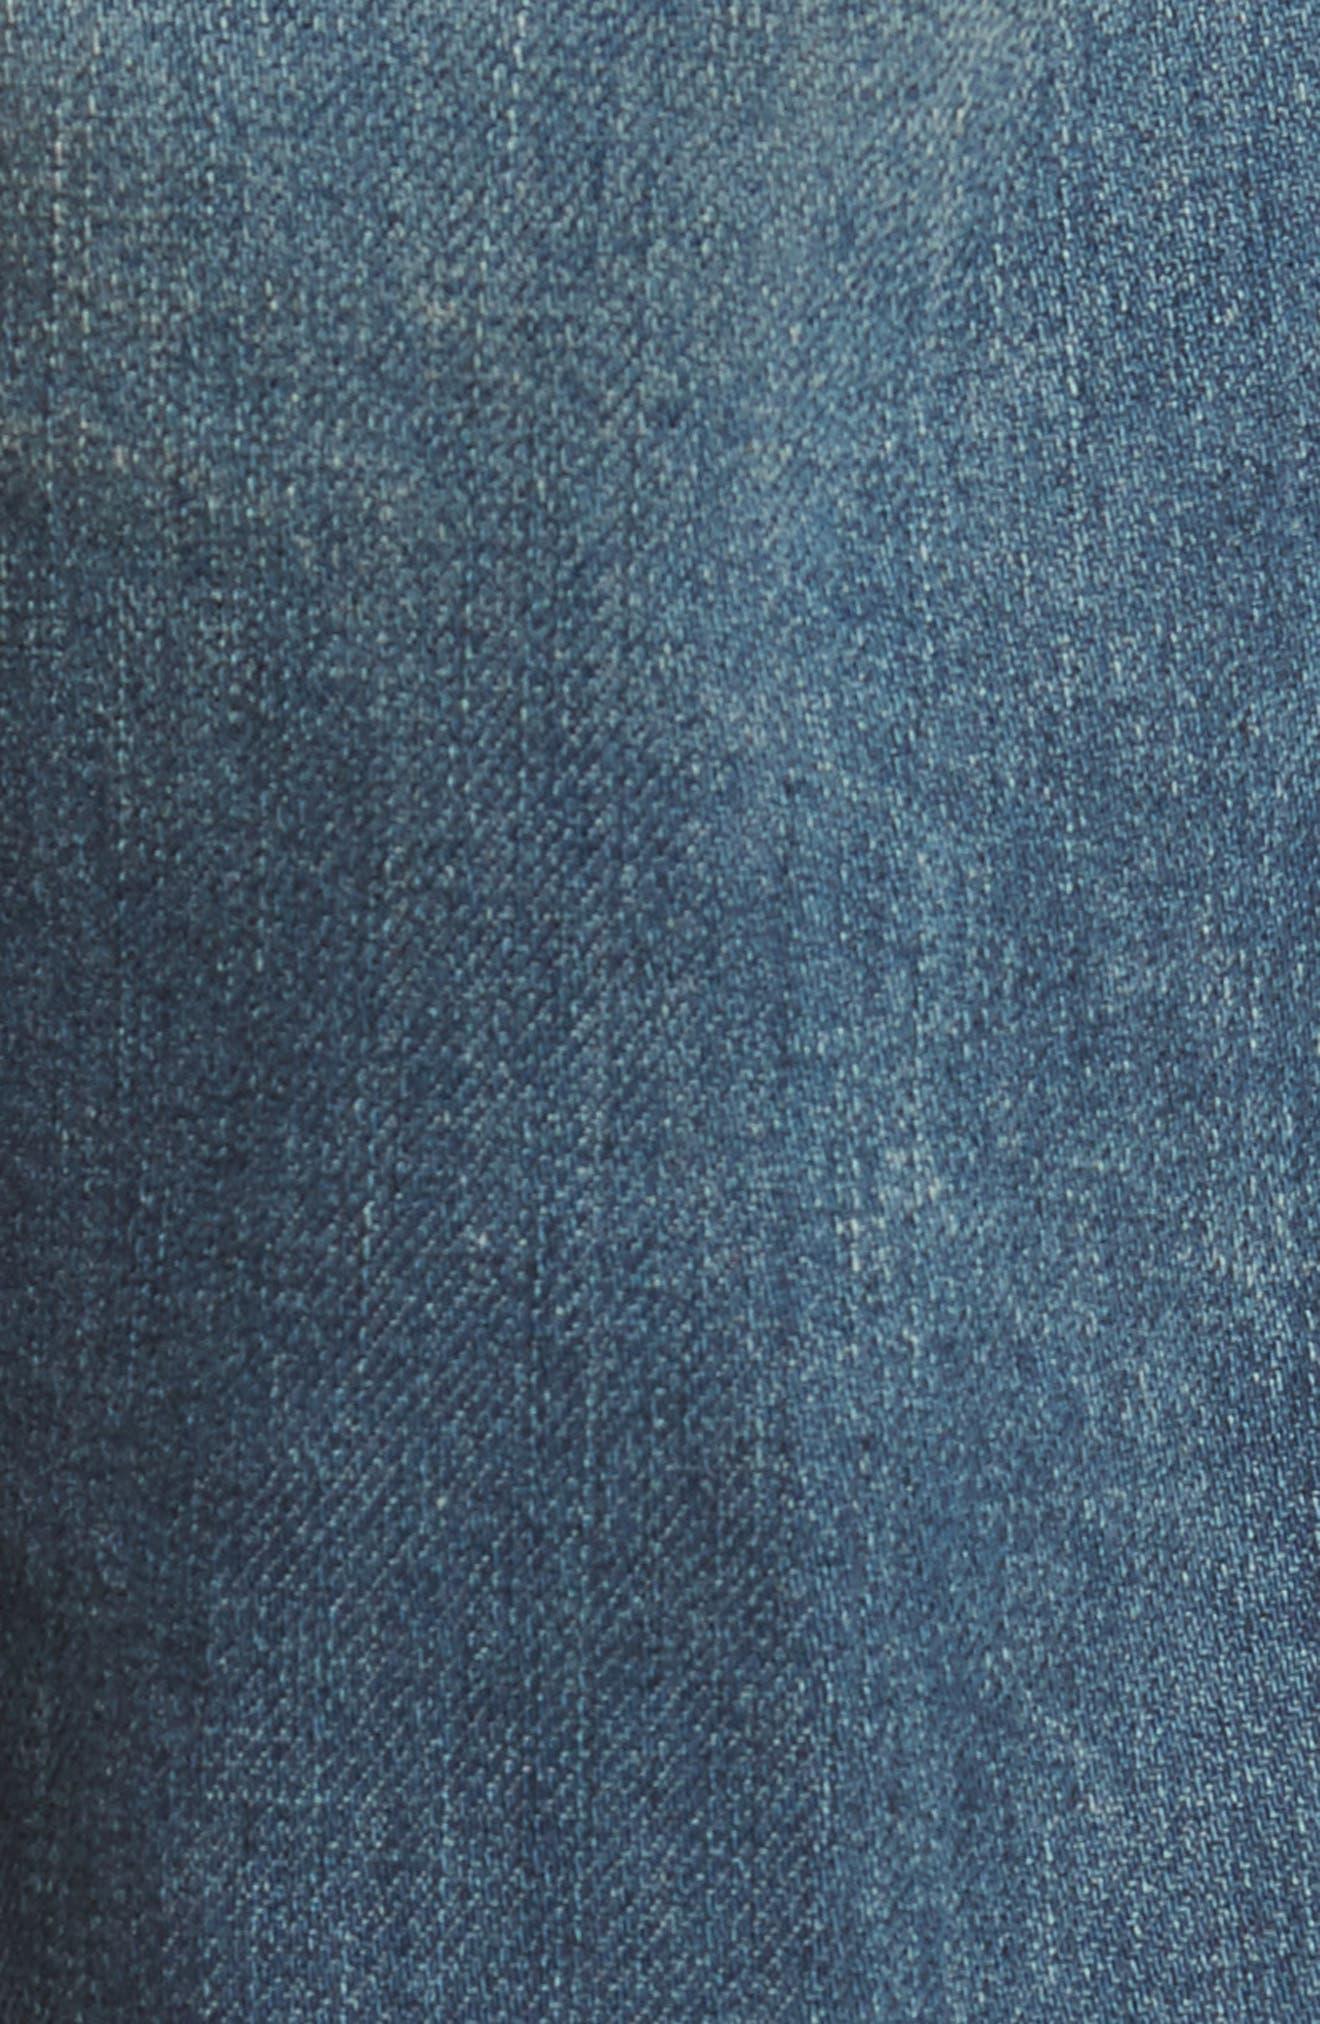 Dylan Slim Skinny Fit Jeans,                             Alternate thumbnail 5, color,                             12 Years River Veil